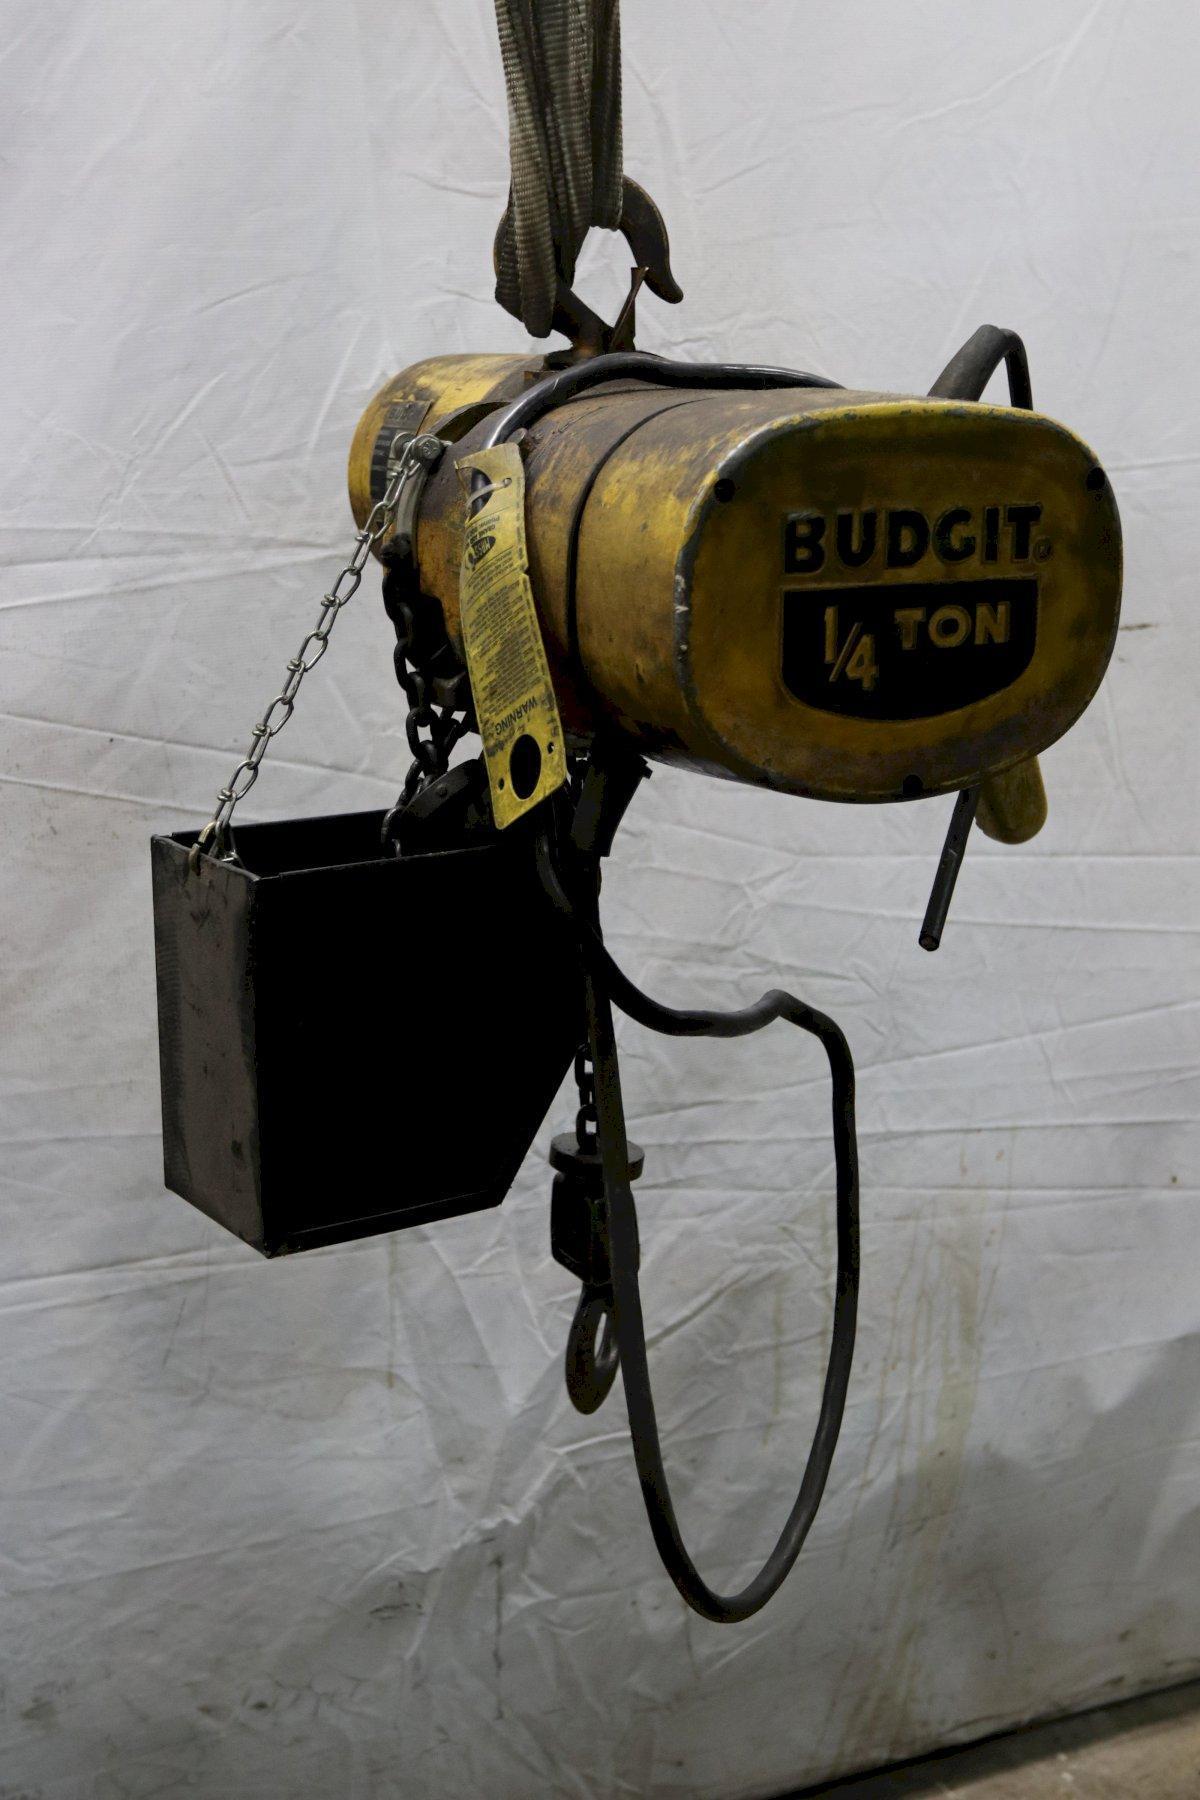 1/4 TON BUDGIT ELECTRIC CHAIN HOIST : STOCK #11989